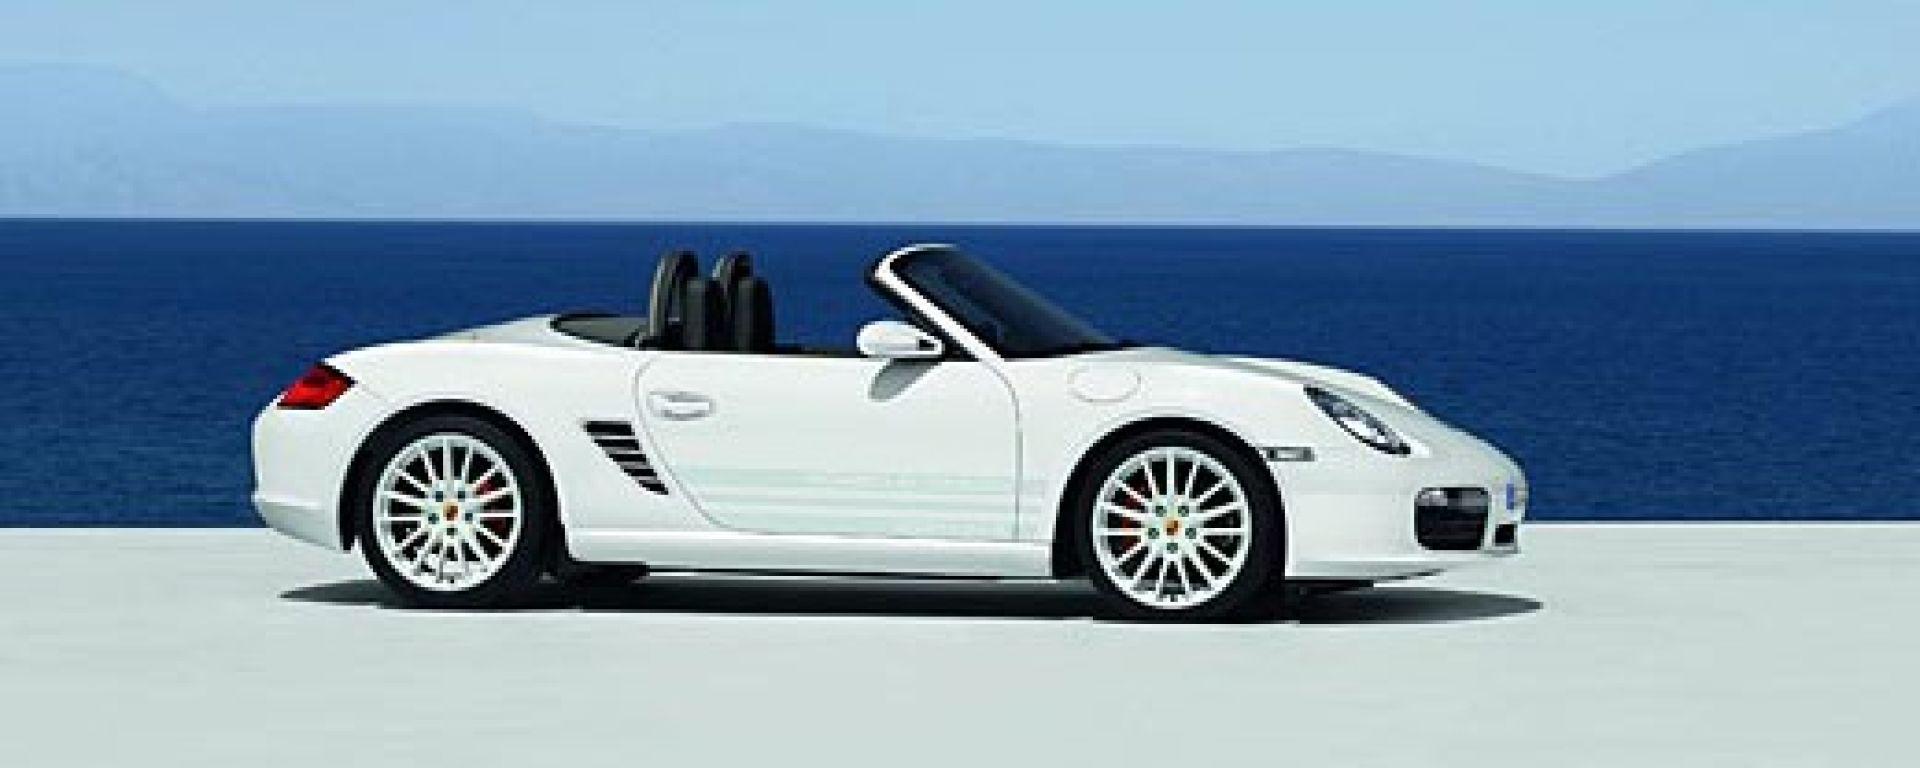 Porsche Boxster e Cayman Limited Edition